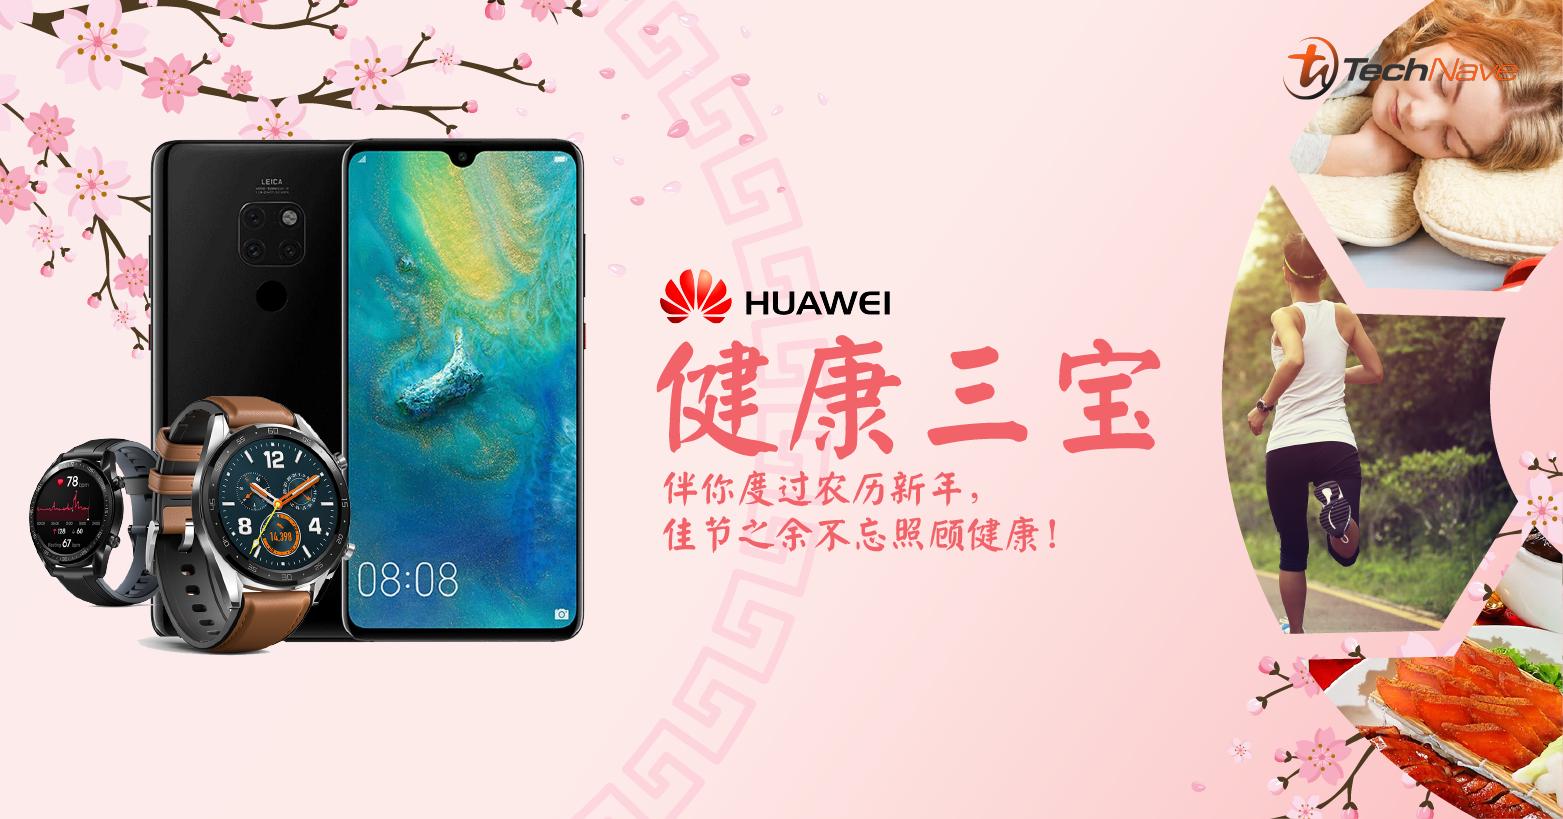 Huawei健康3宝伴你度过农历新年,佳节之余不忘照顾健康!